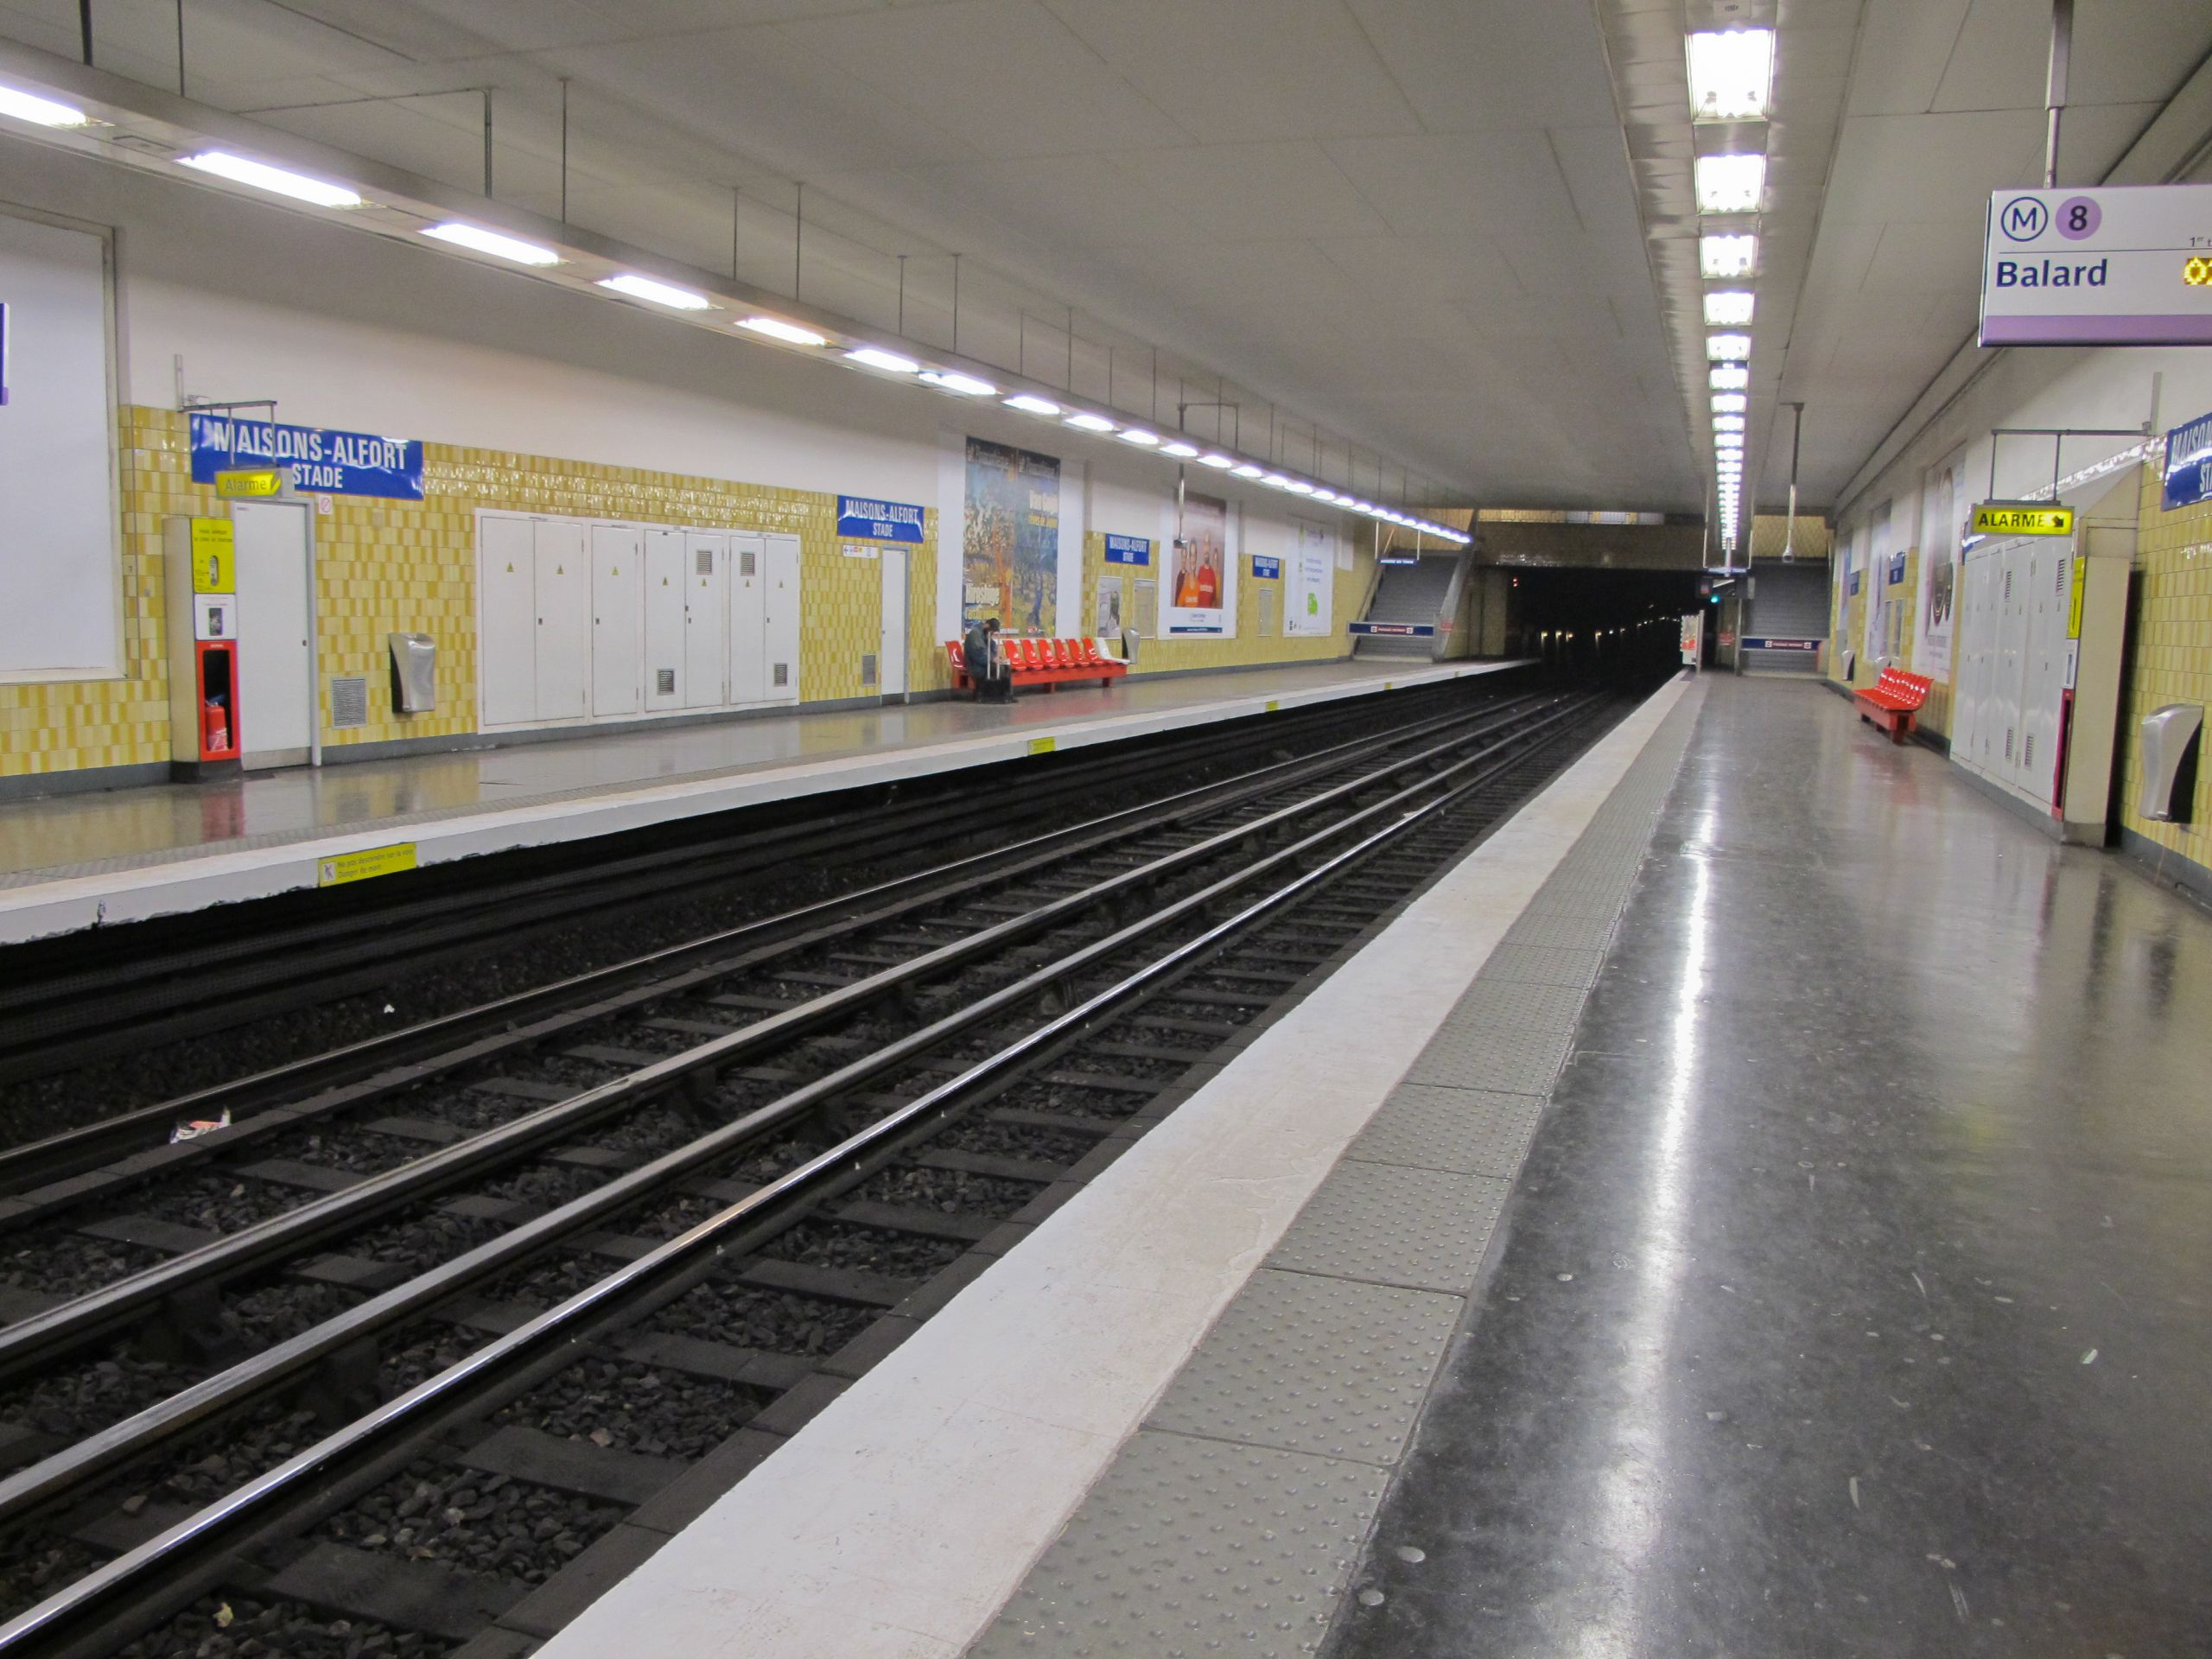 Station métro Maisons Alfort Stade IMG 3667